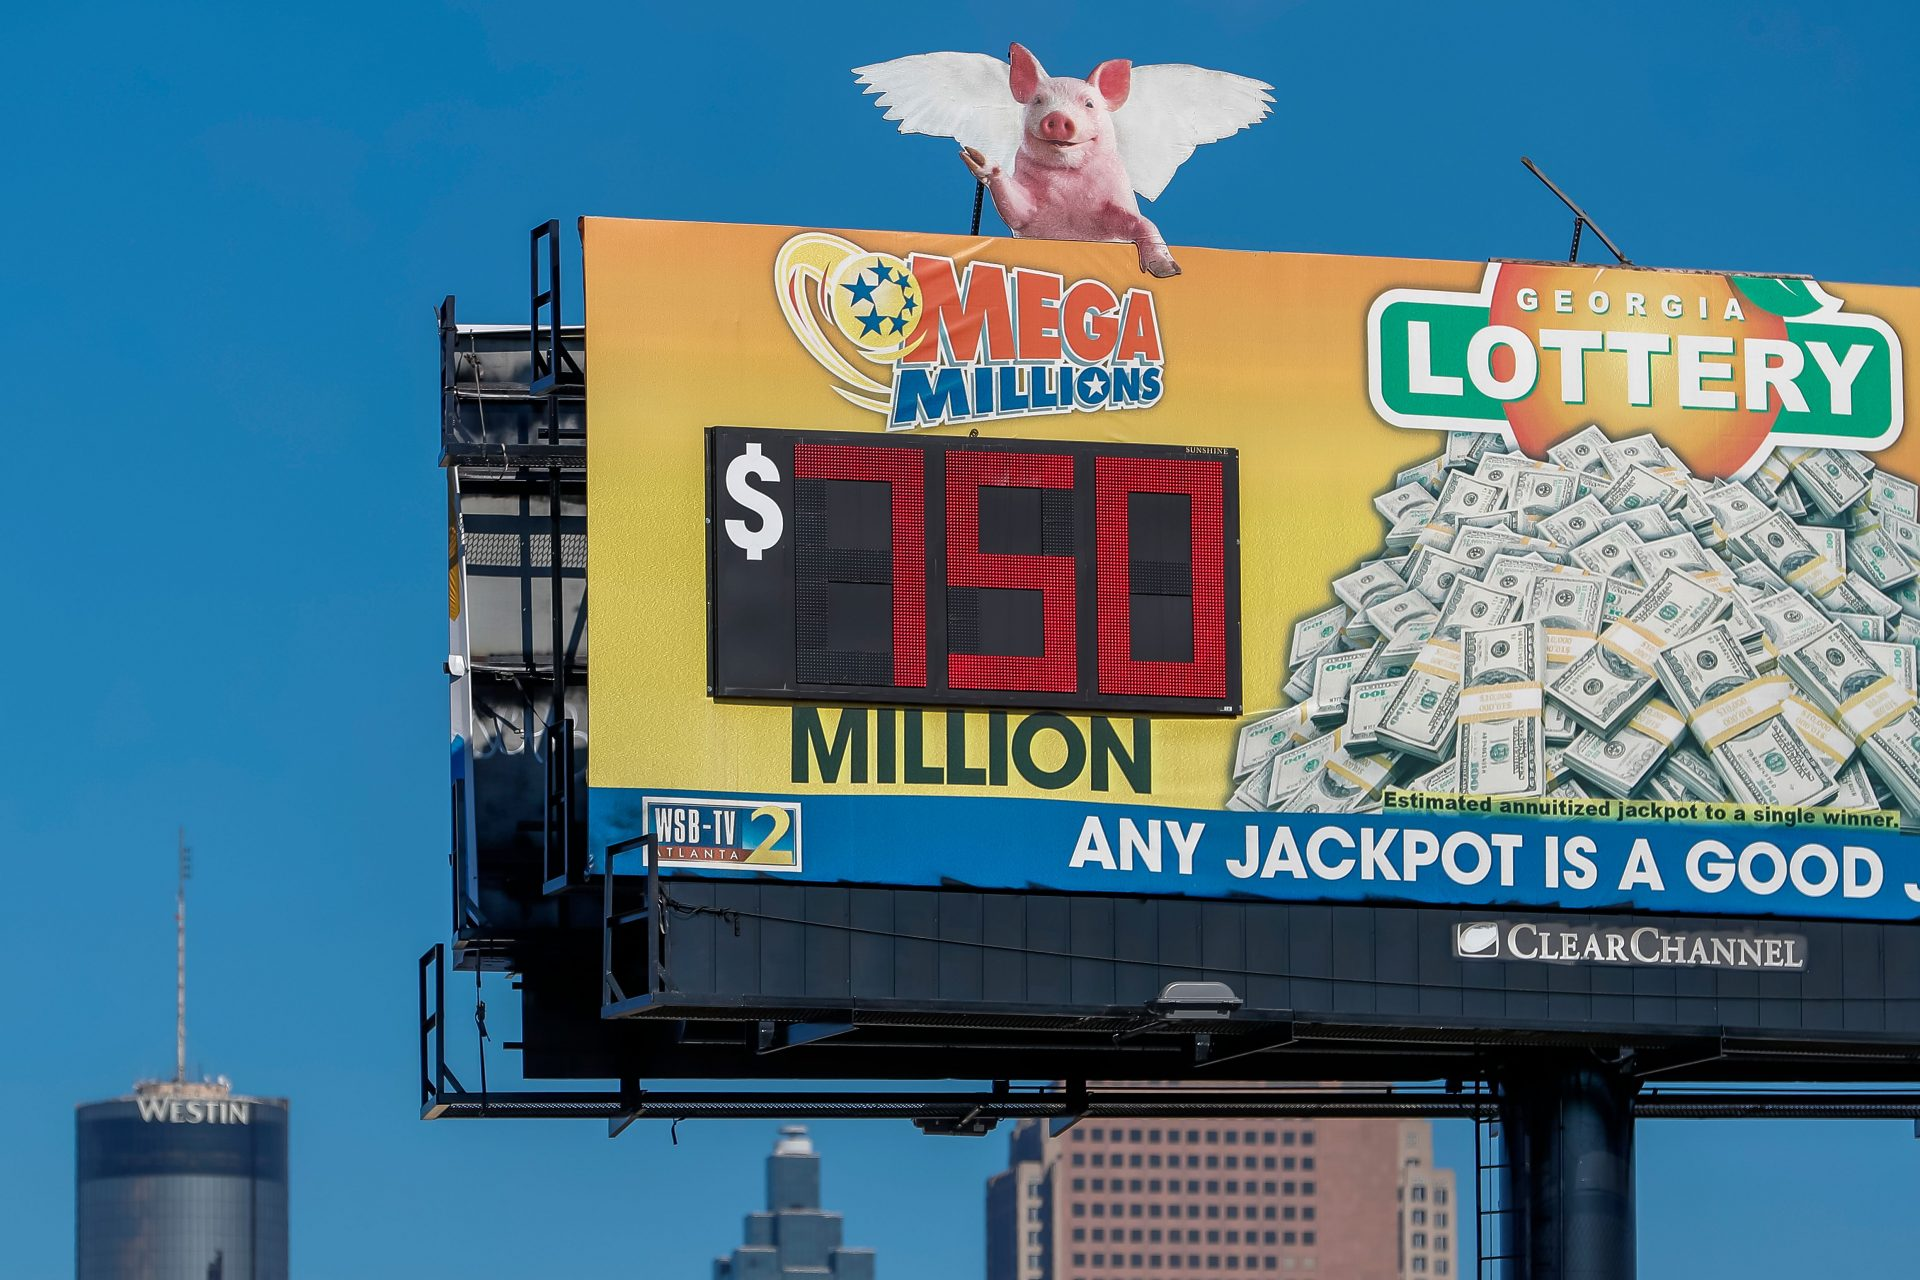 Mandatory Credit: Photo by ERIK S LESSER/EPA-EFE/Shutterstock (11706057b)A billboard displays the Mega Millions multi-state lottery jackpot in Atlanta, Georgia, USA, 13 January 2021.